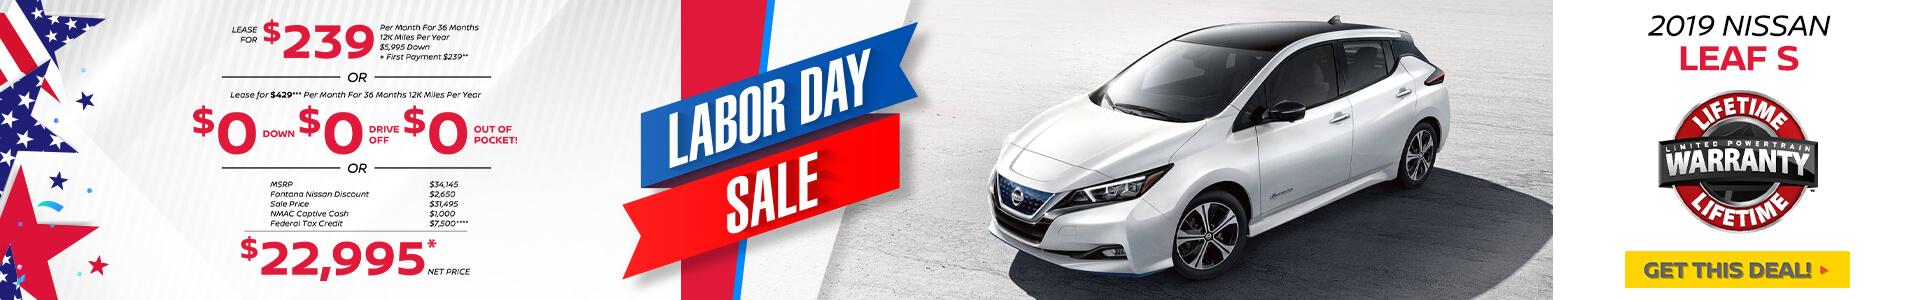 Nissan Leaf $239 Lease